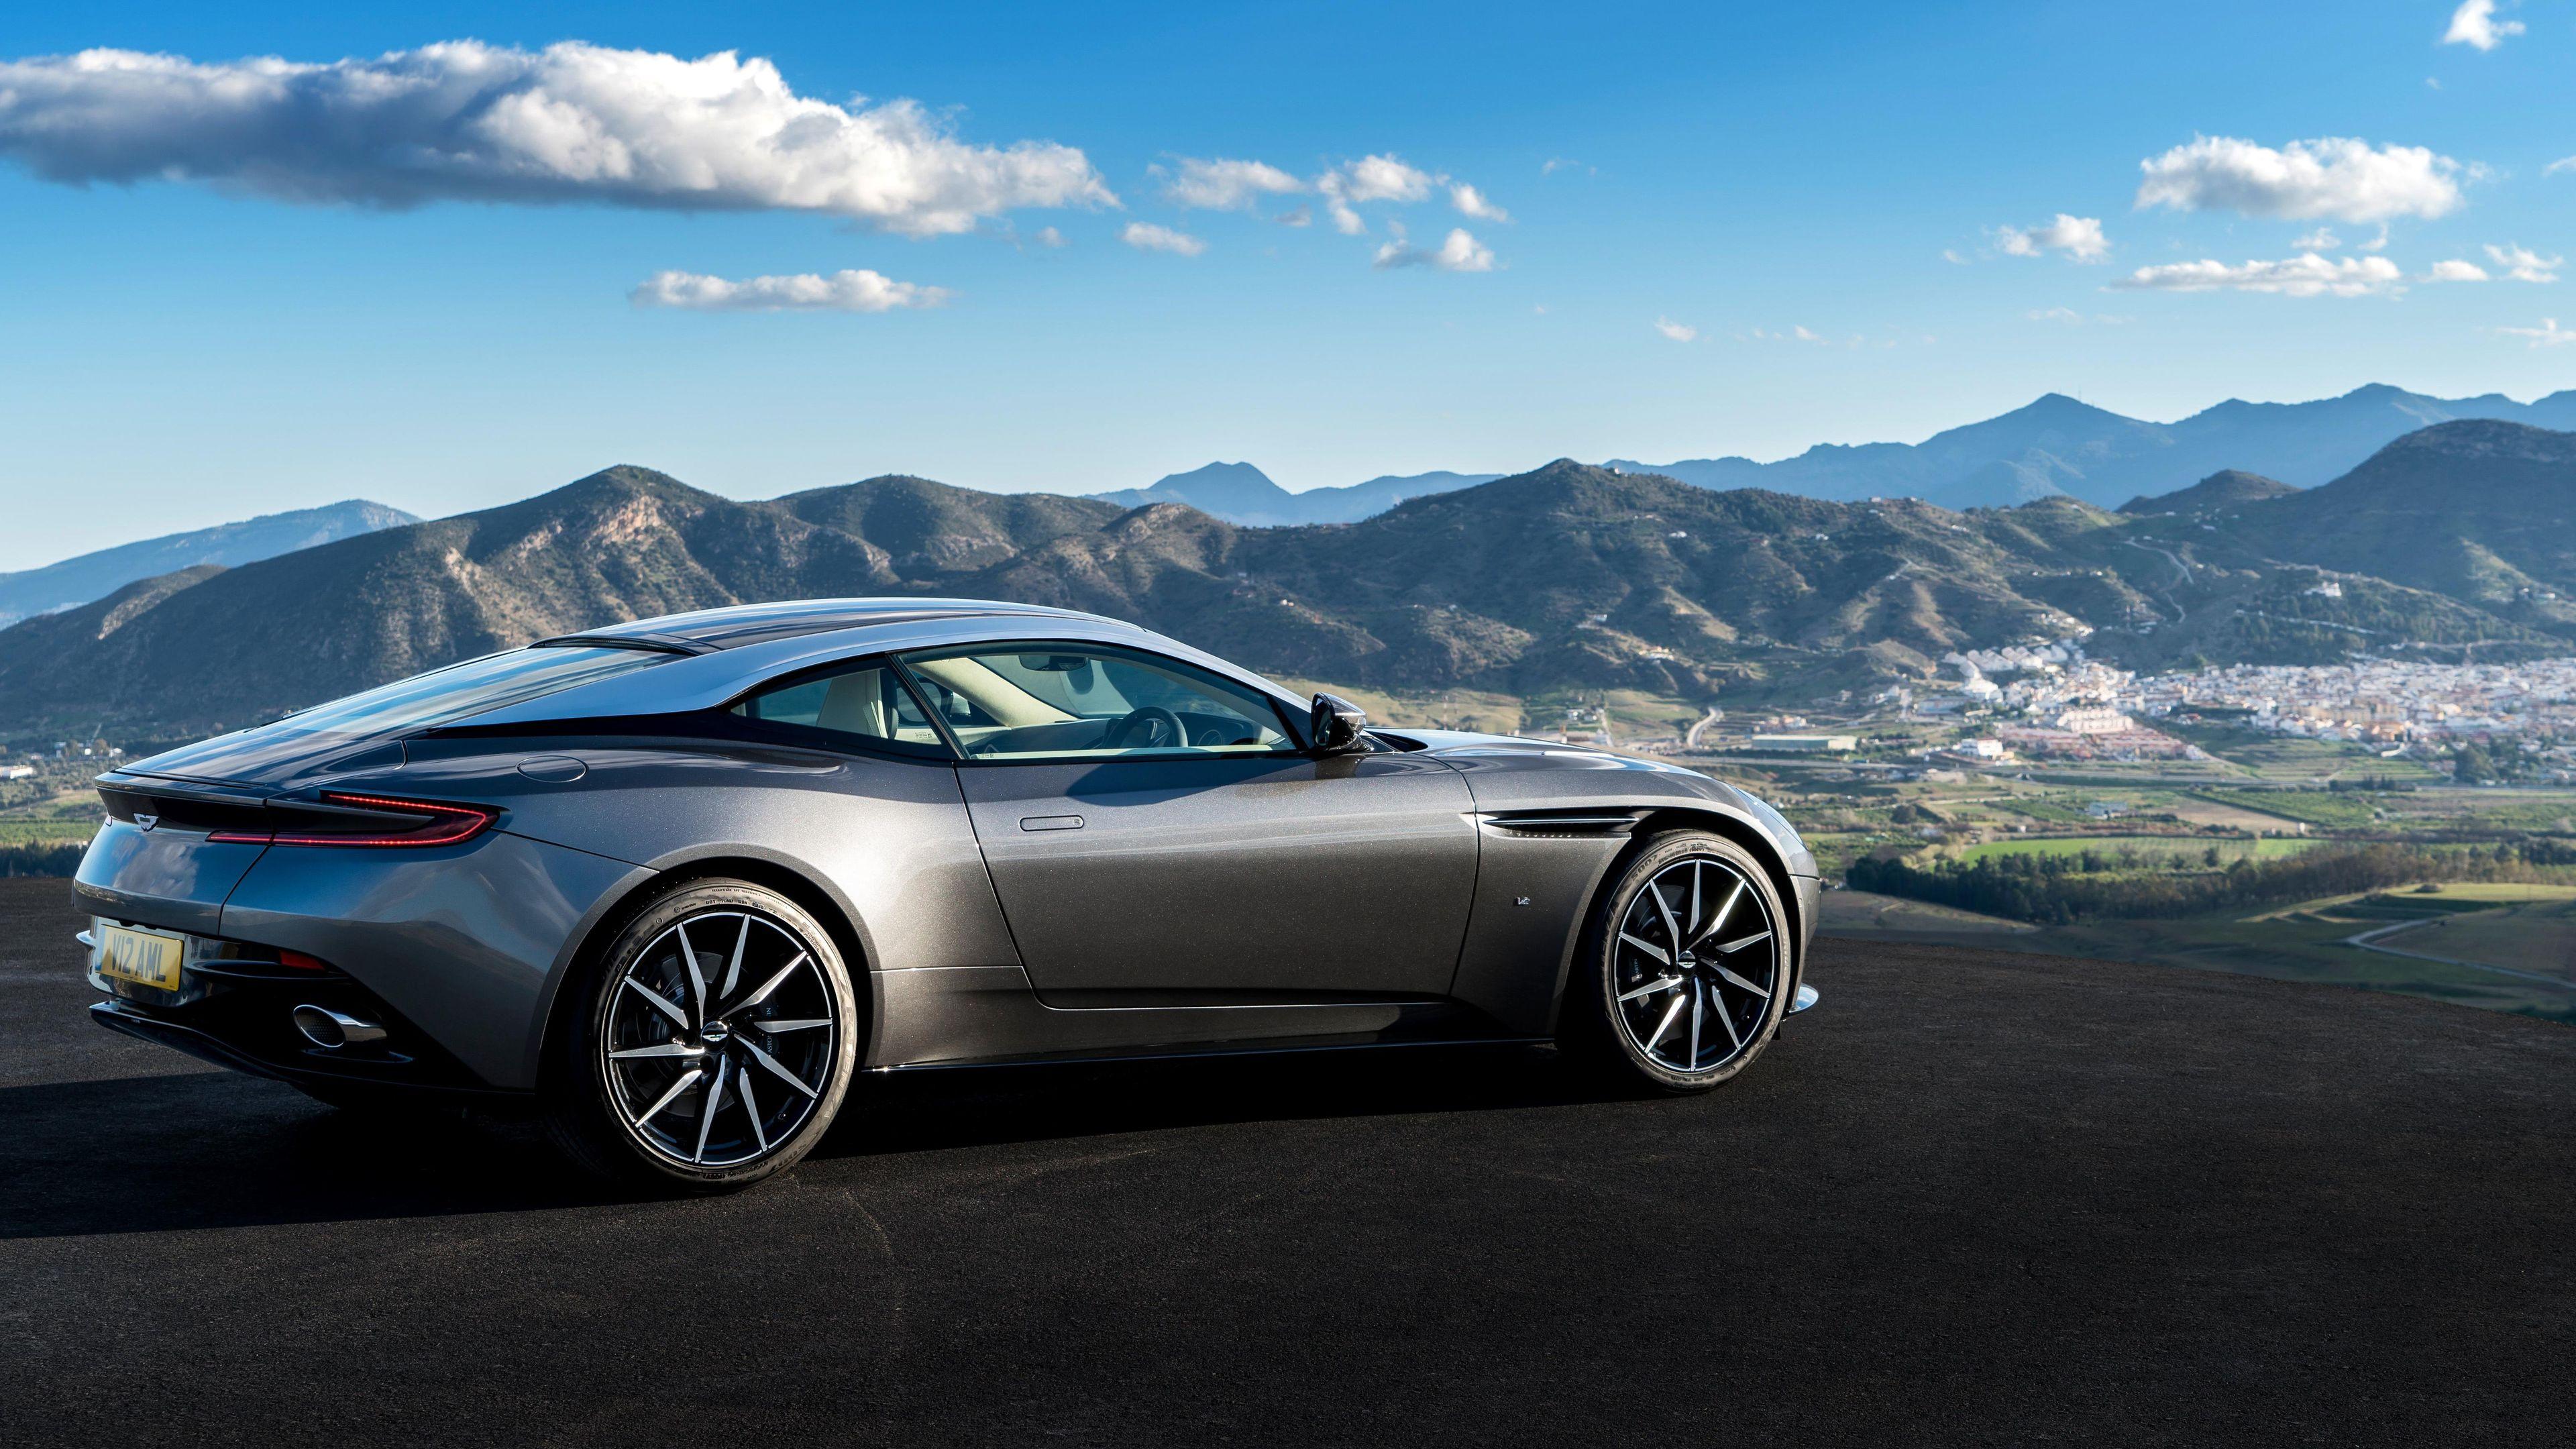 Wallpaper 4k Aston Martin 4k 4k Wallpapers 5k Wallpapers